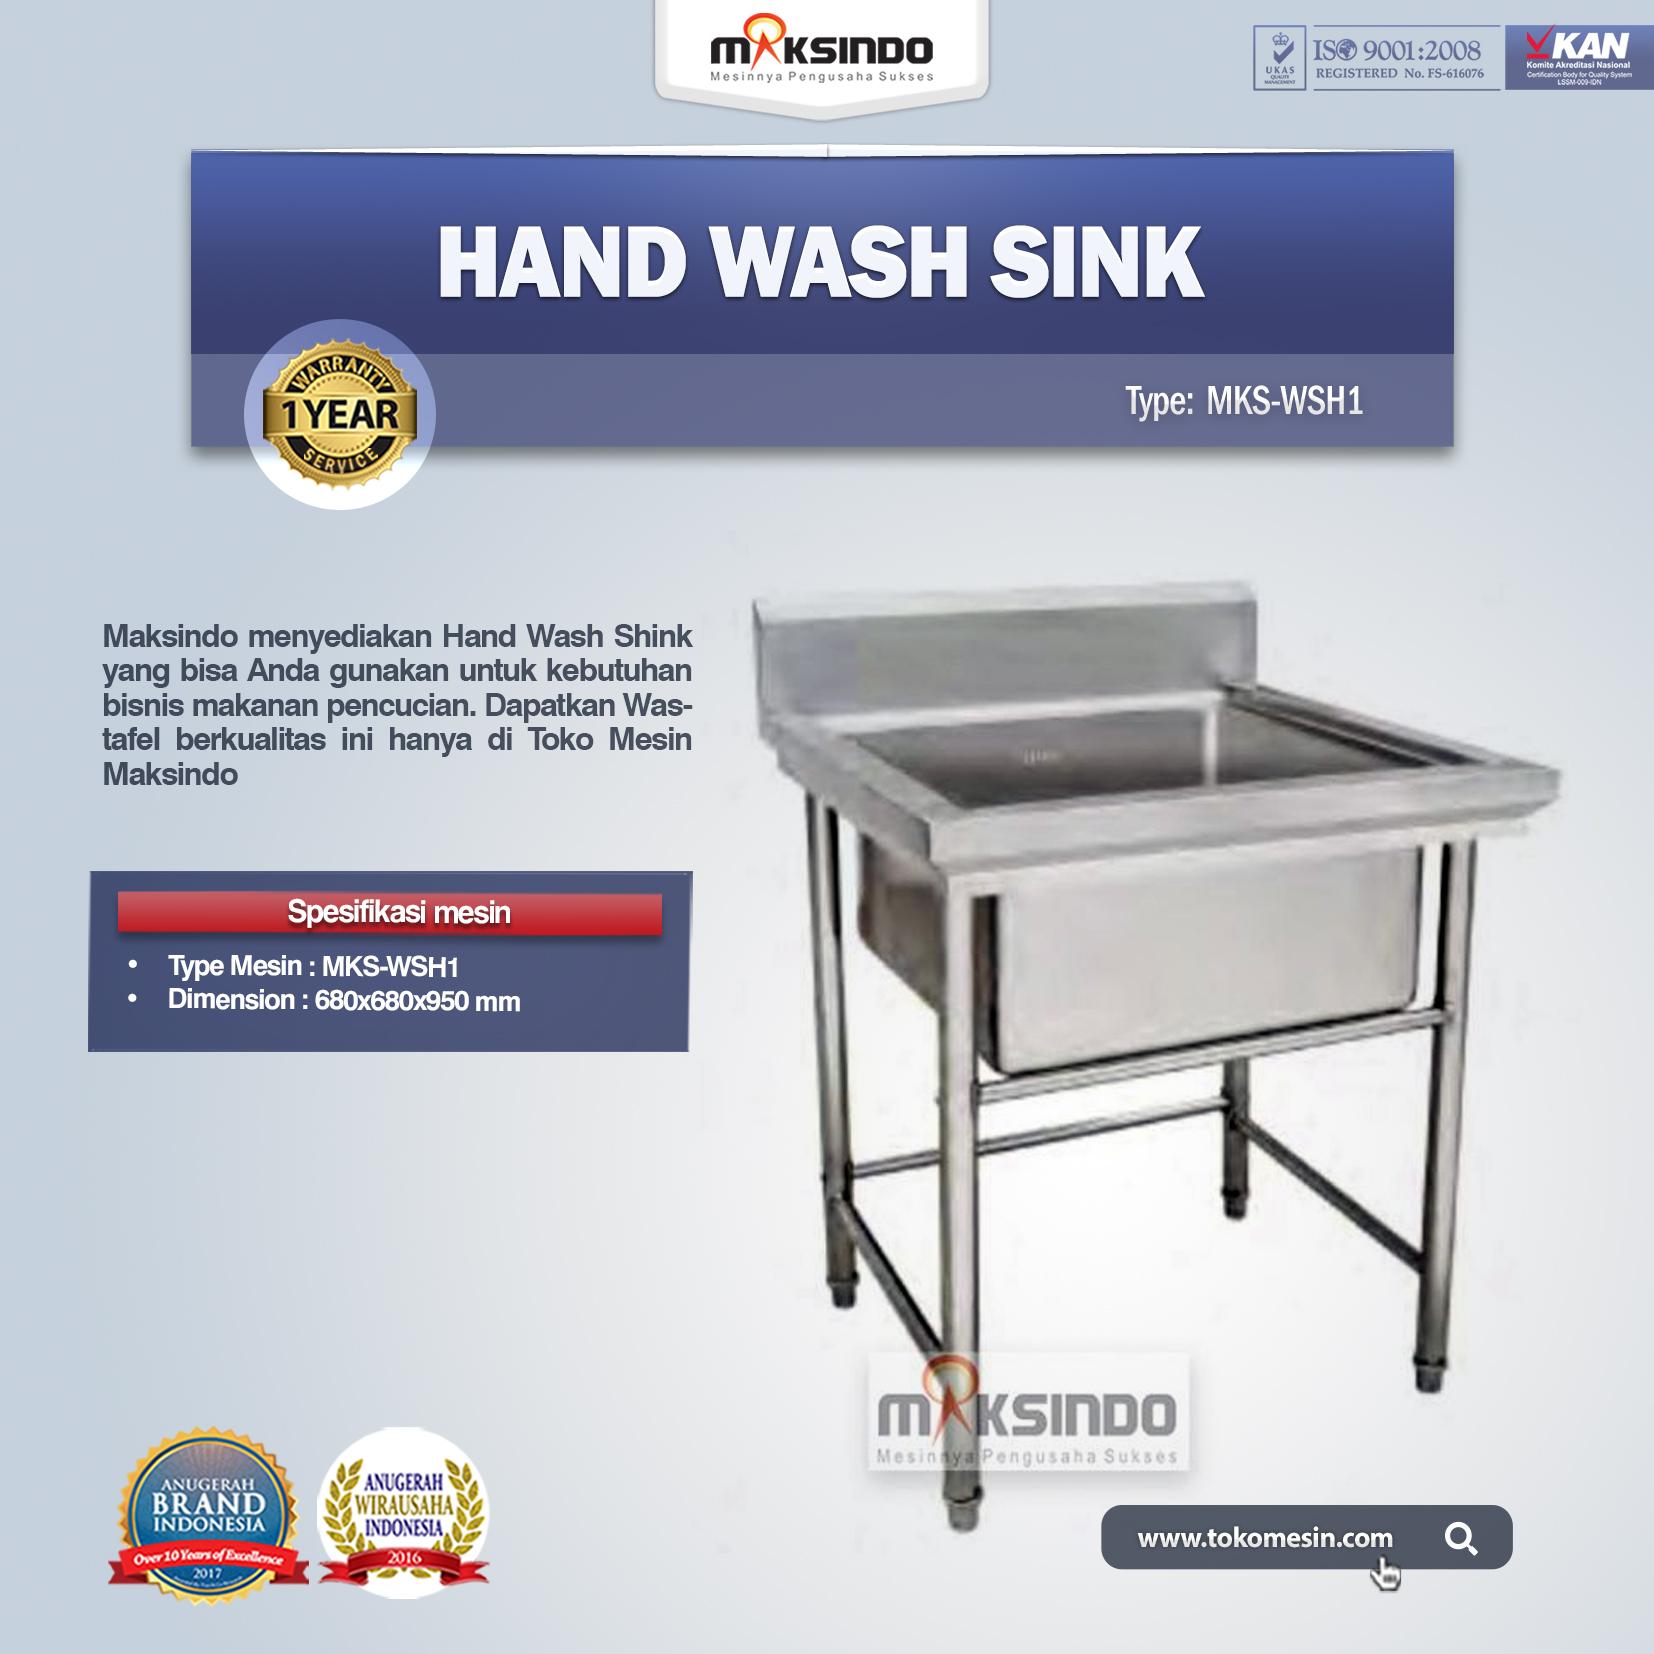 Jual Hand Wash Sink MKS WSH1 Di Bandung